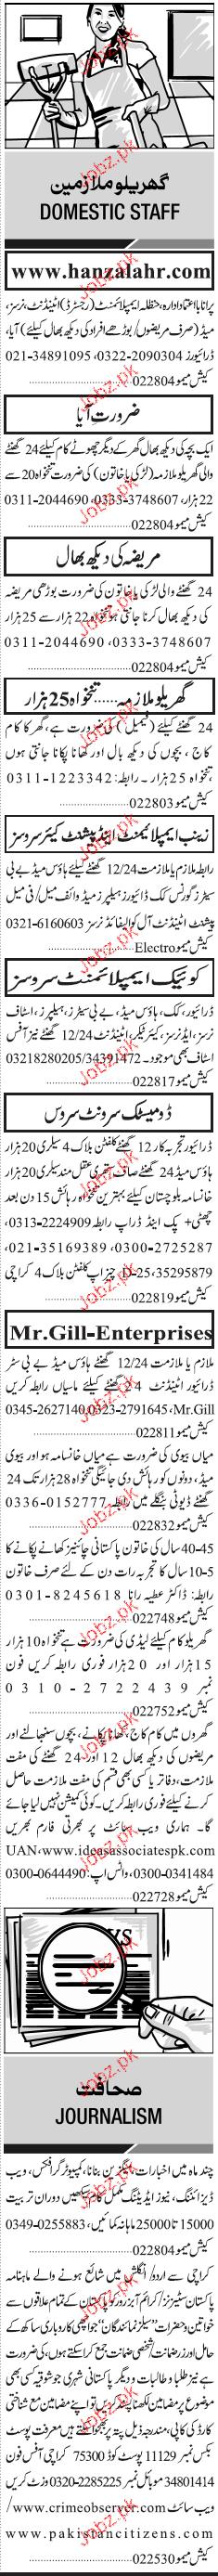 Attendants, Nurses, Maid, Chawkidars Job Opportunity